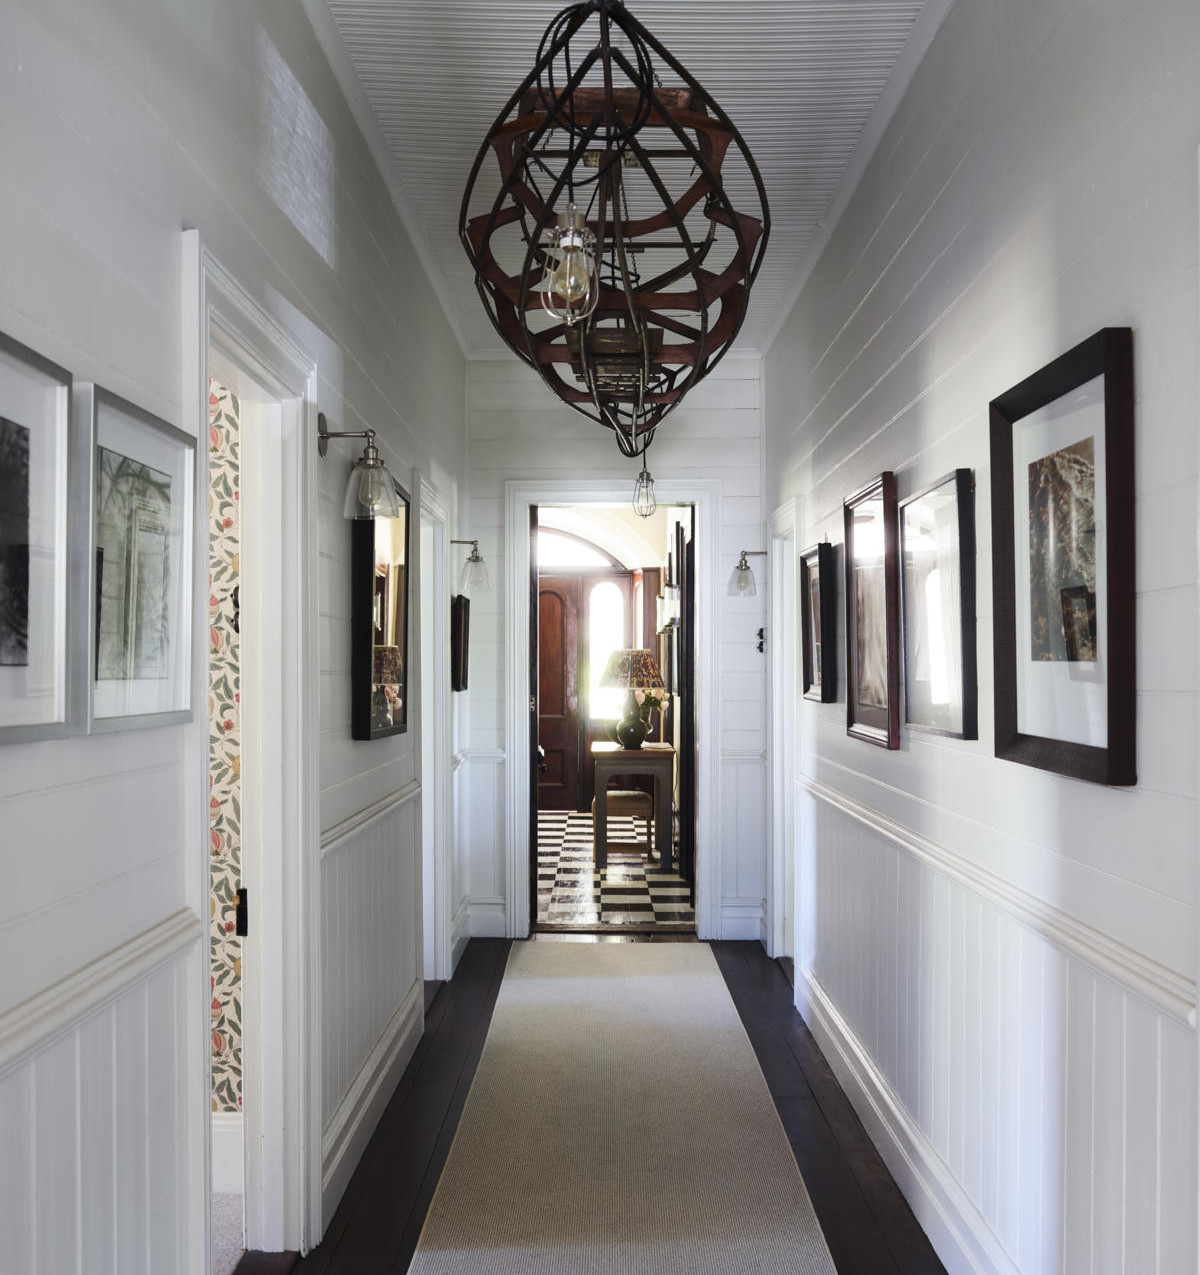 Guest Room Gallery